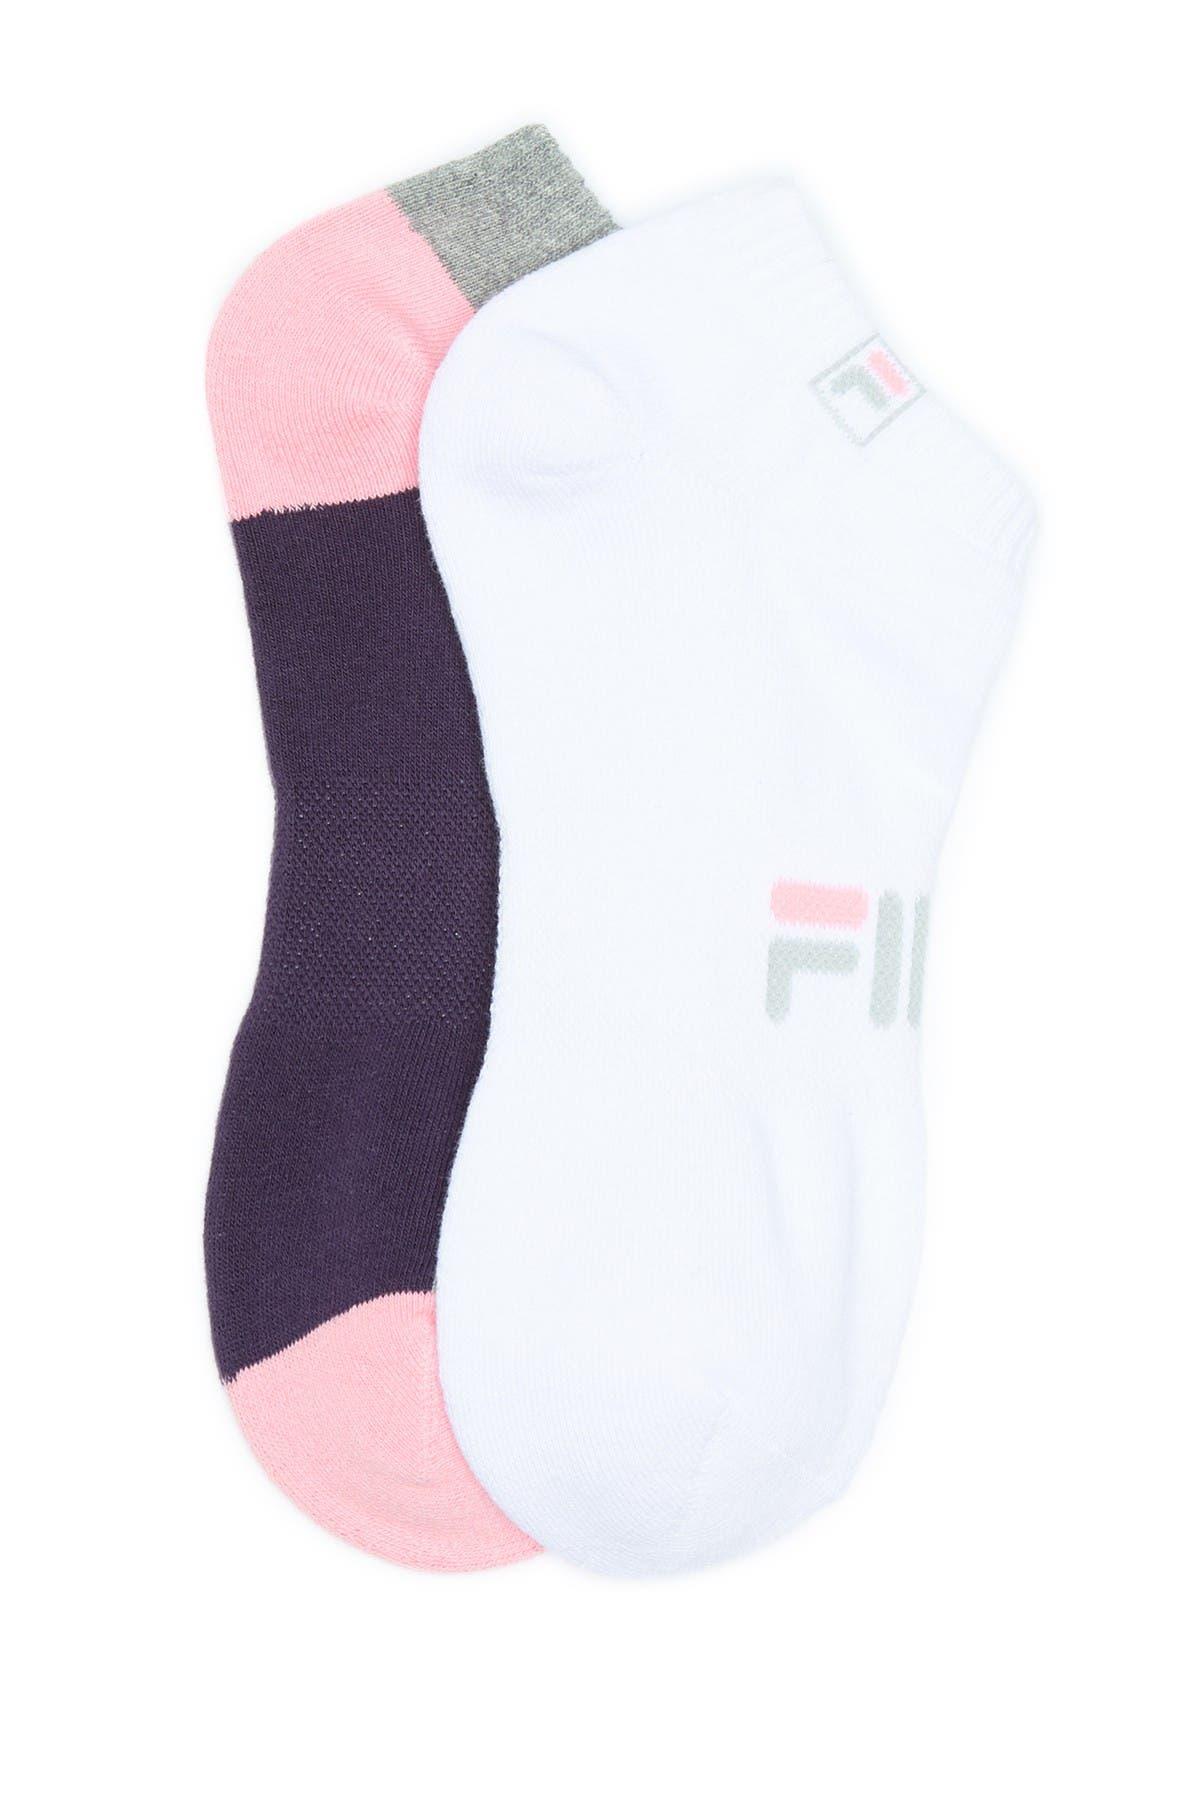 Image of FILA USA Alternate Sole No Show Socks - Pack of 2